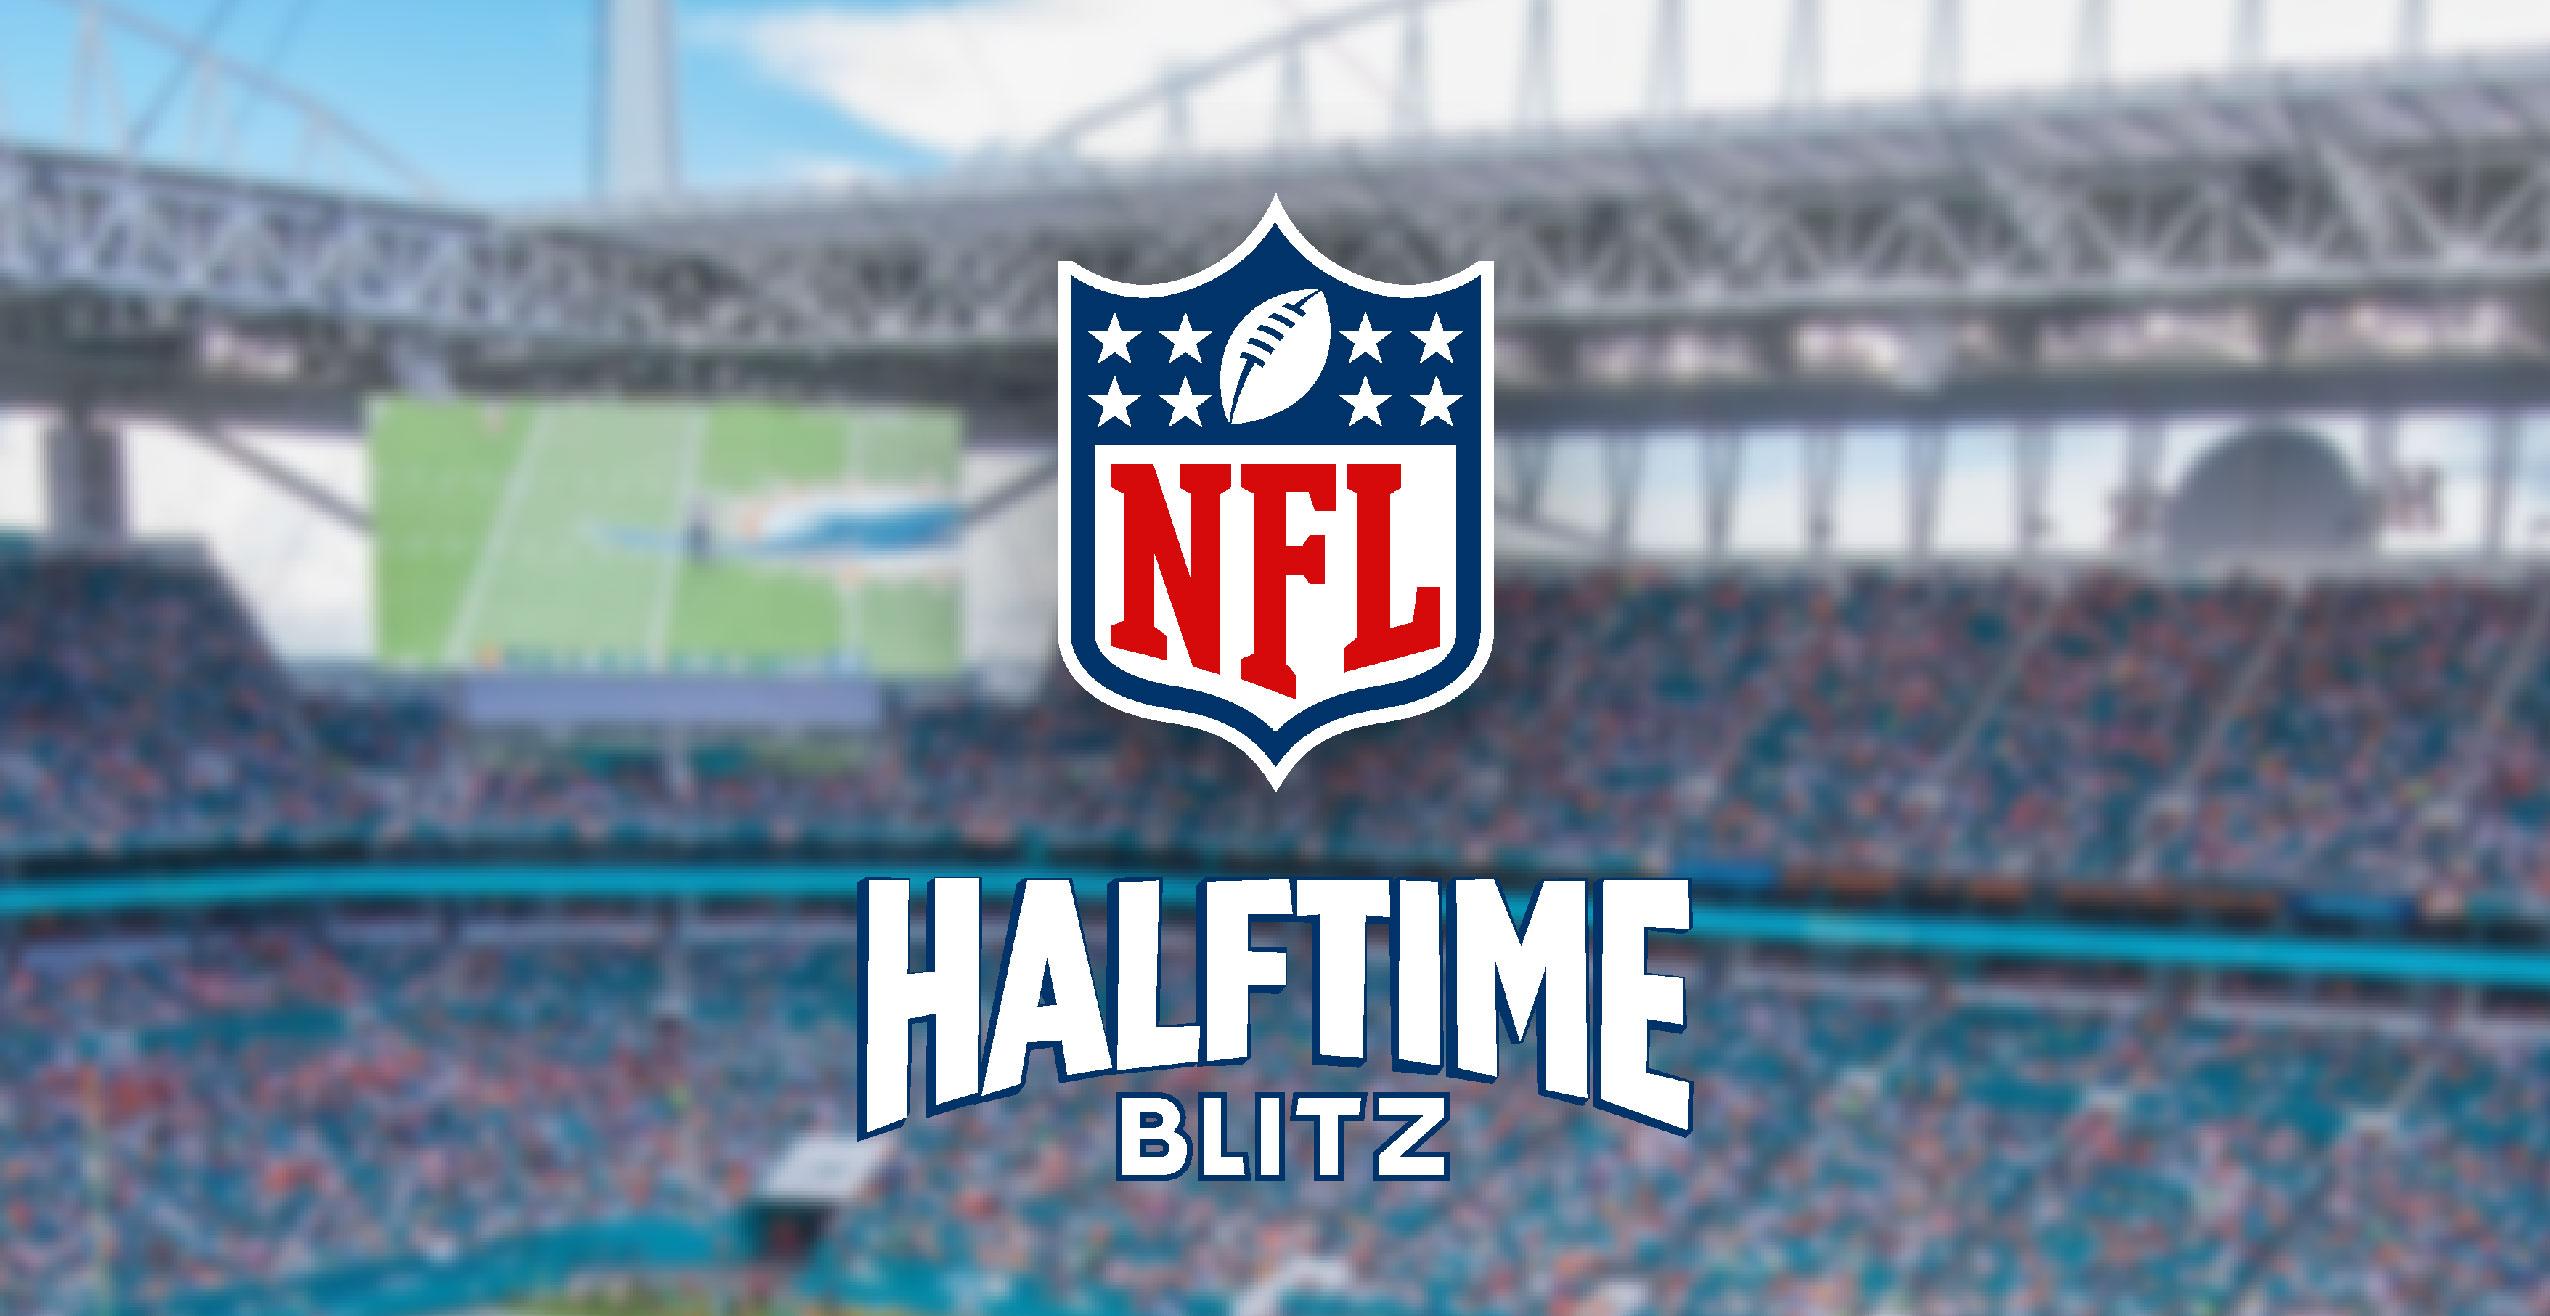 NFL Halftime Blitz